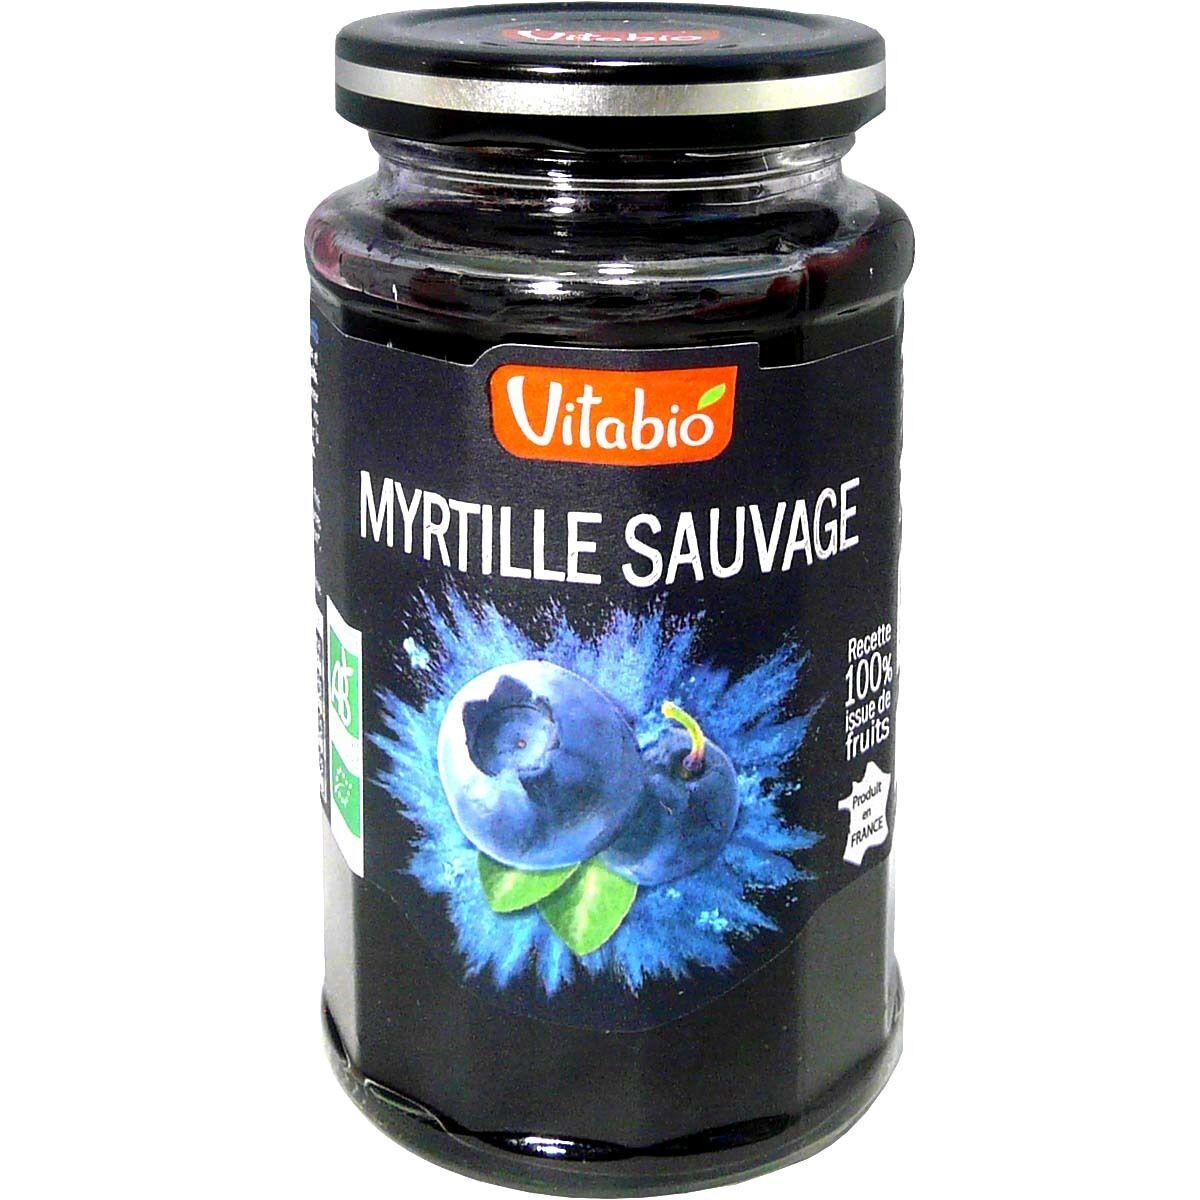 Vitabio delice myrtille sauvage bio 290g